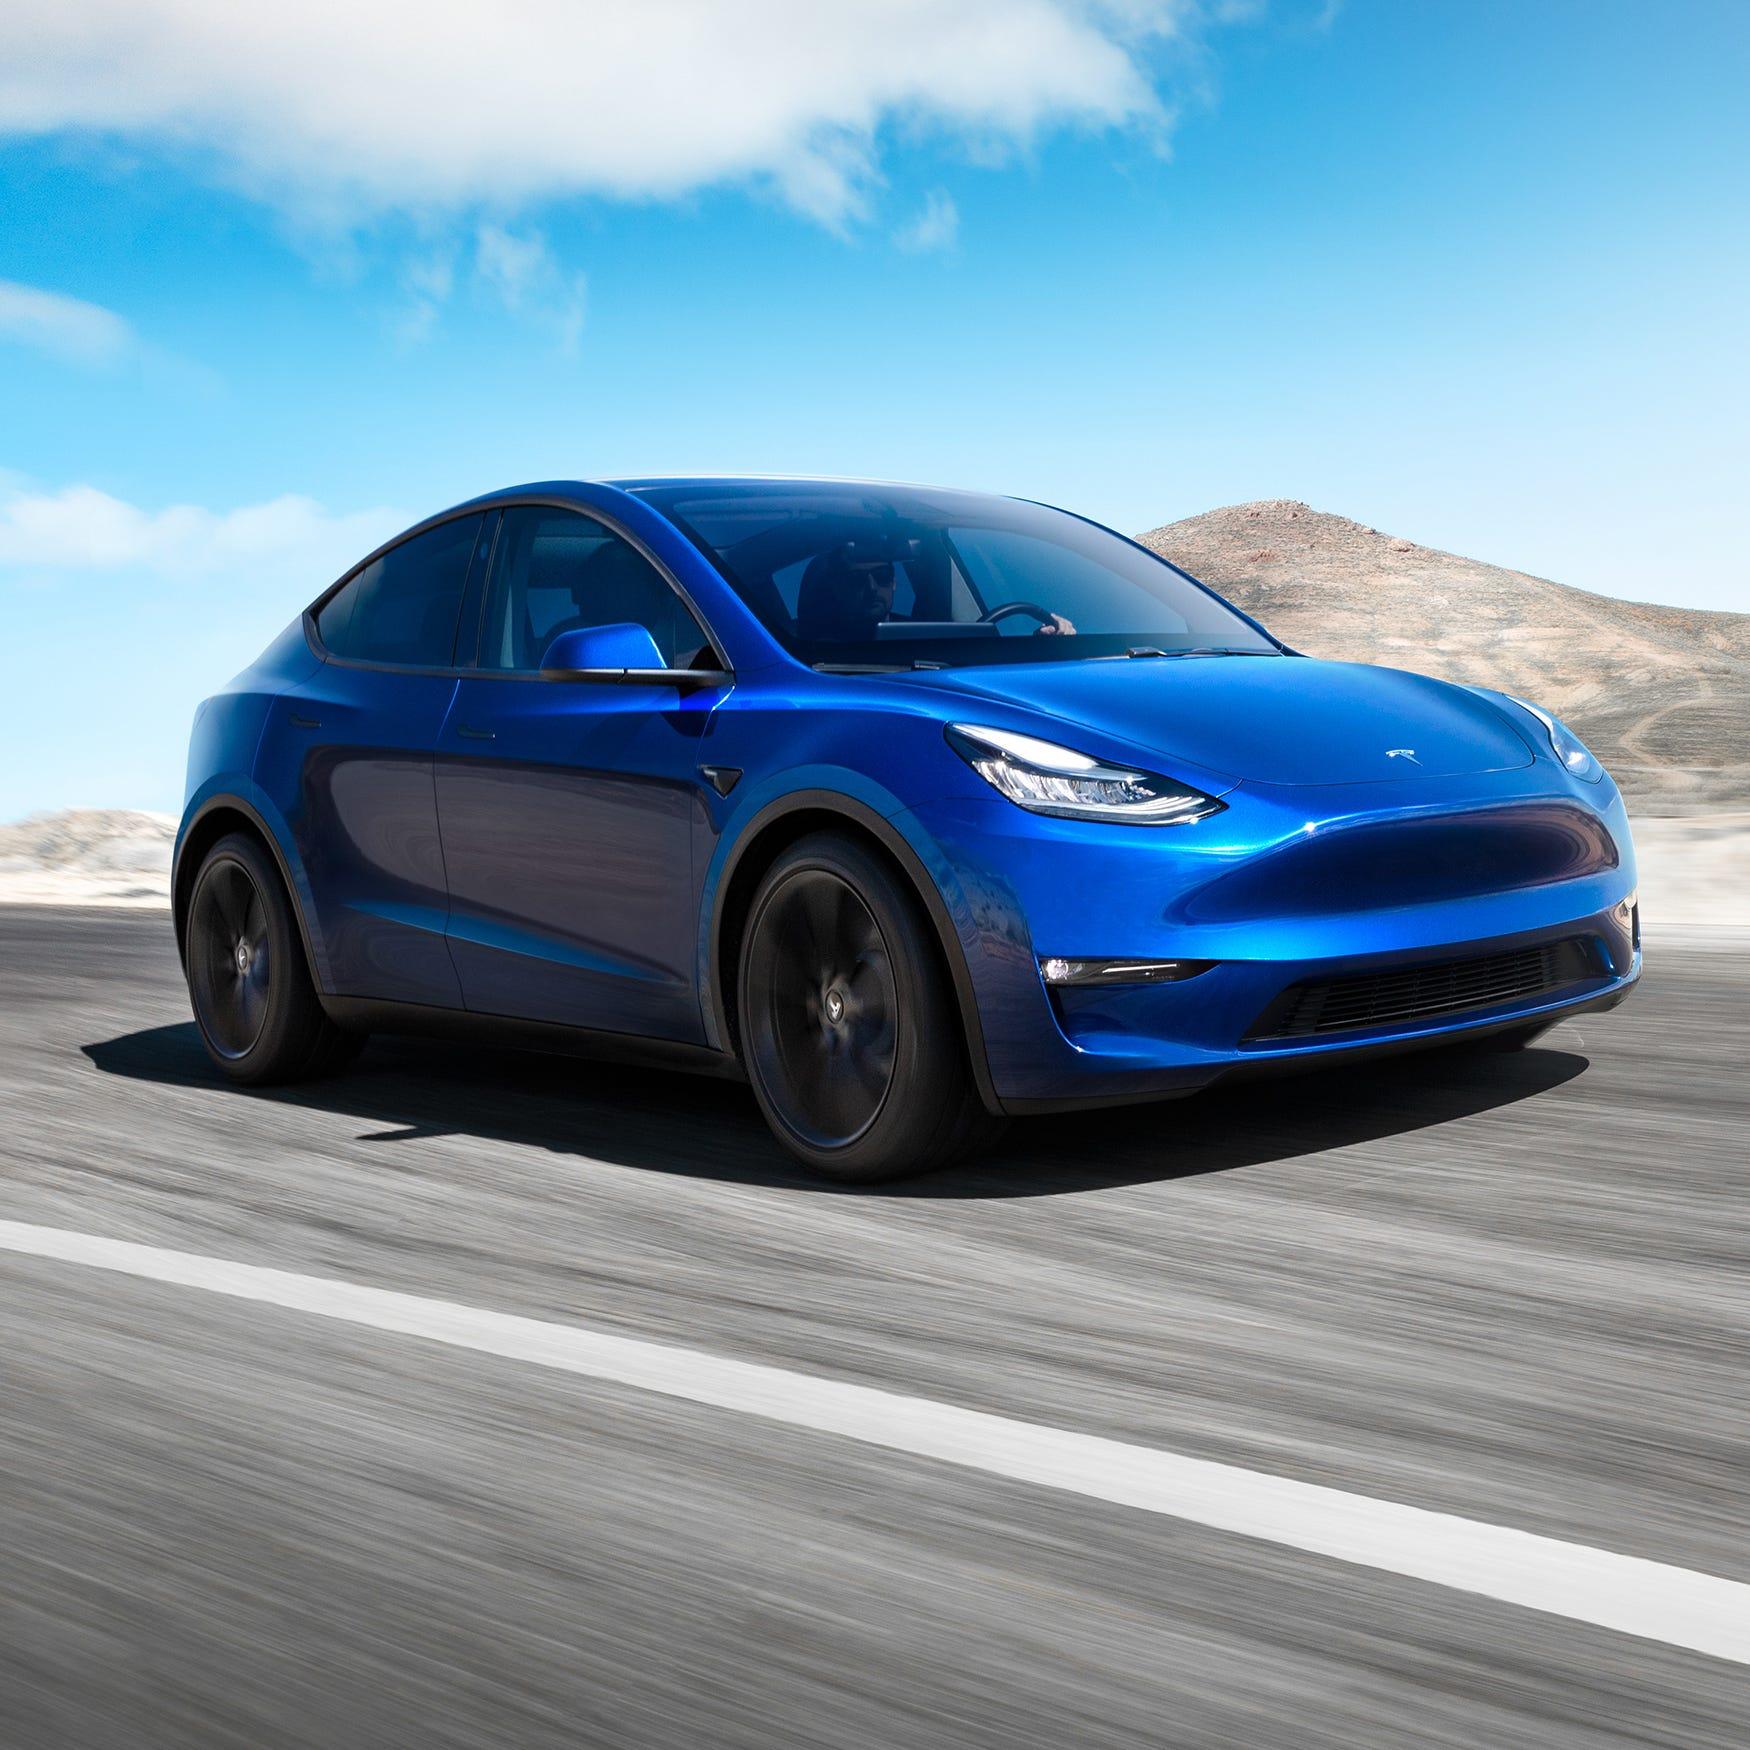 Model 3 with a hatch: Tesla reveals 'sexy' Model Y ute